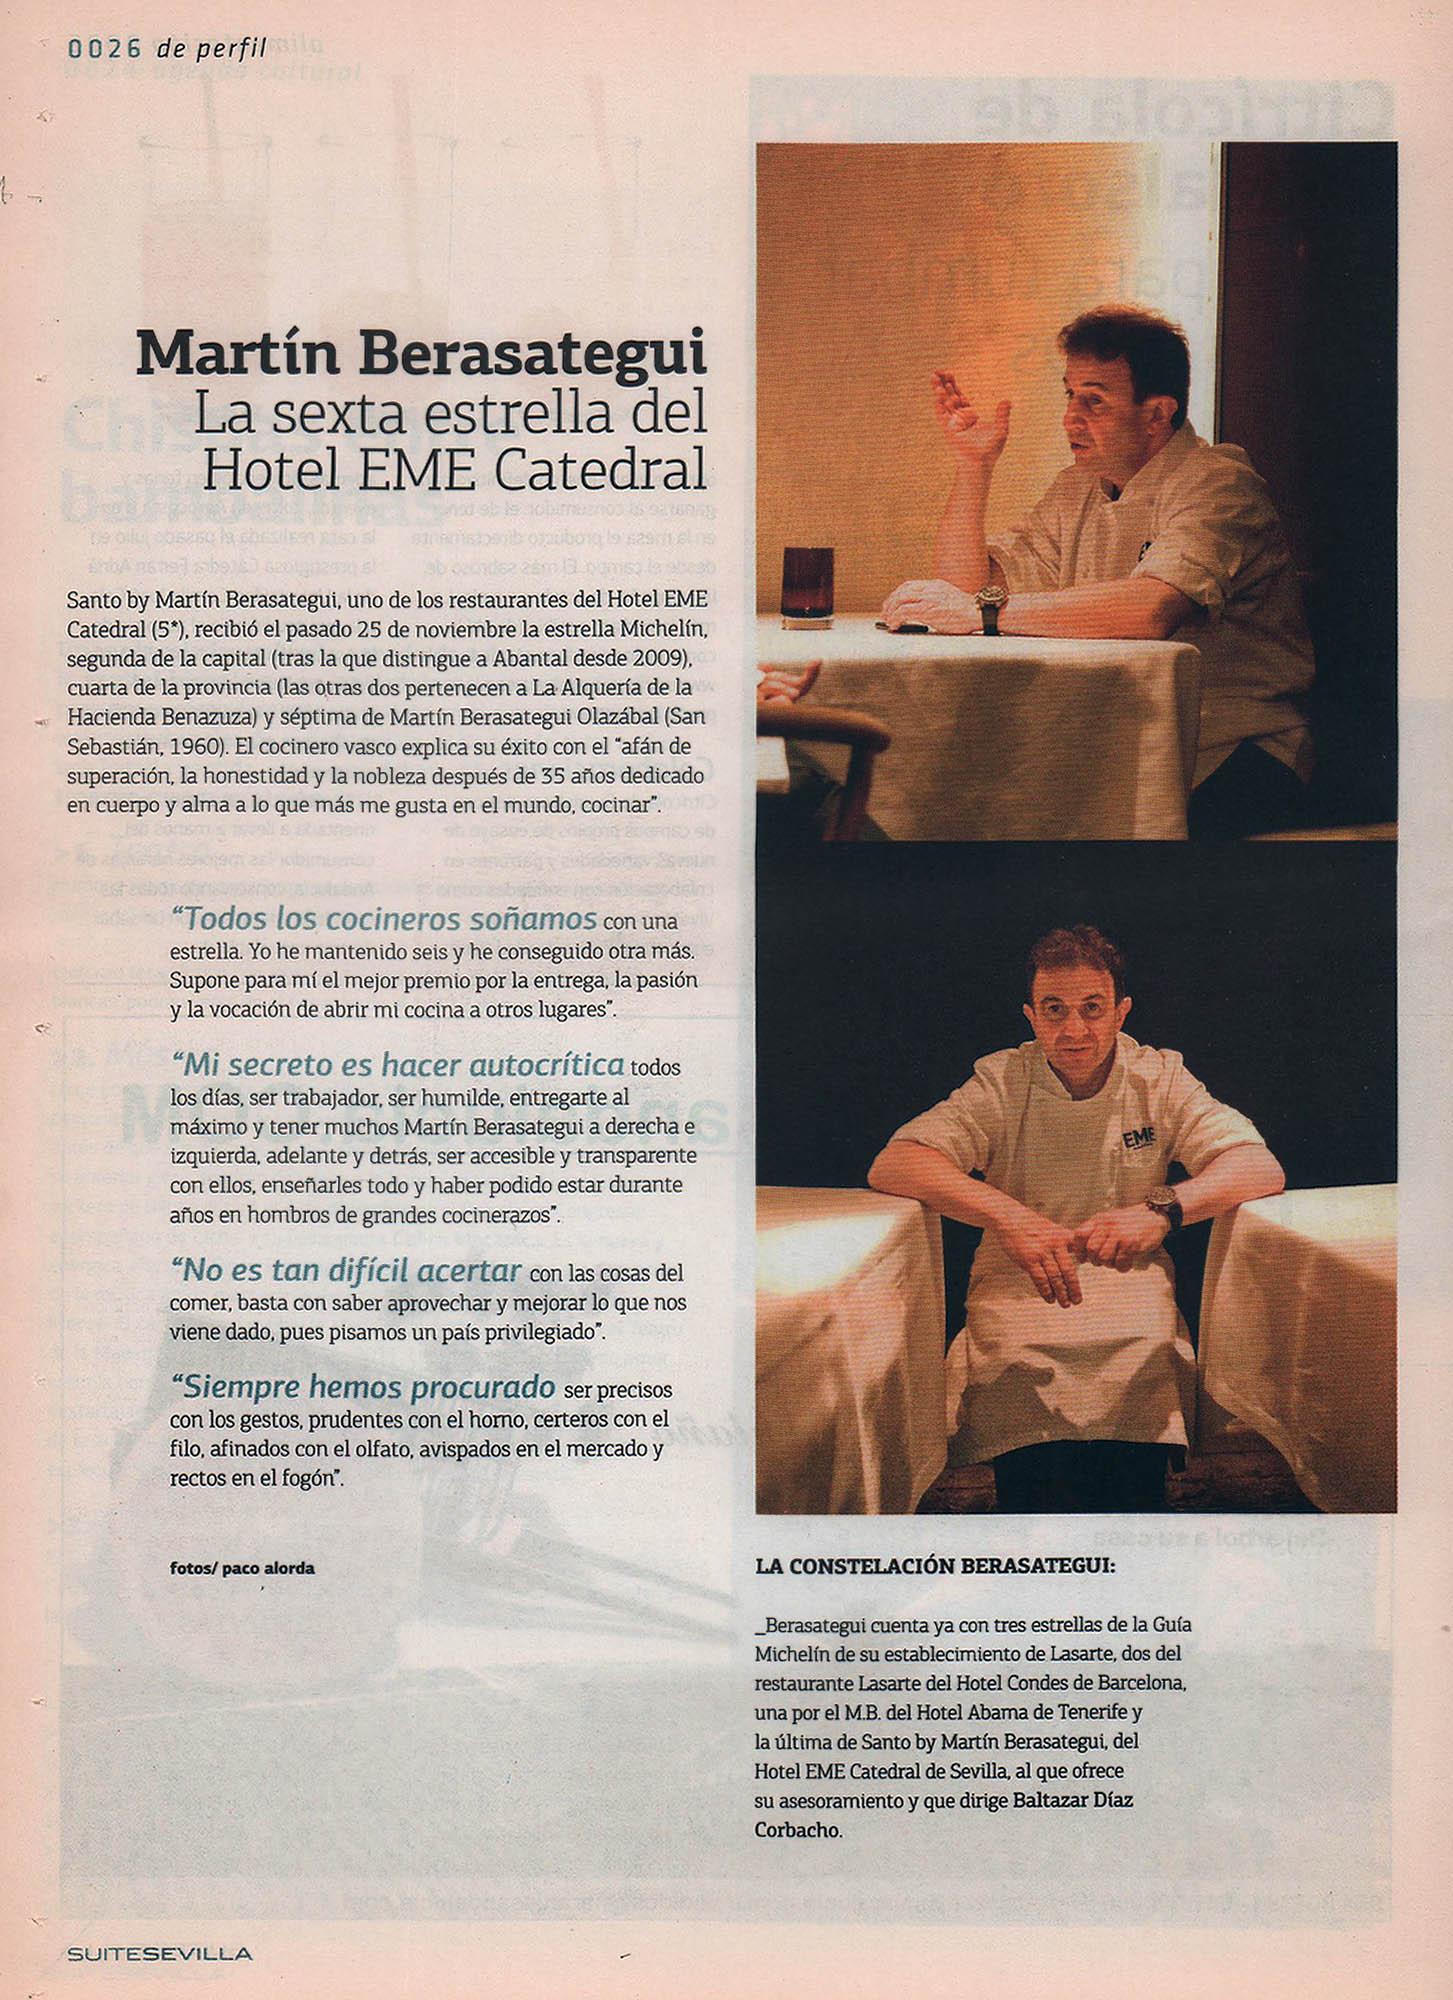 Martín Berasategui: la sexta estrella del Hotel EME Catedral | Suite Sevilla – ABC de Sevilla | dic 2010